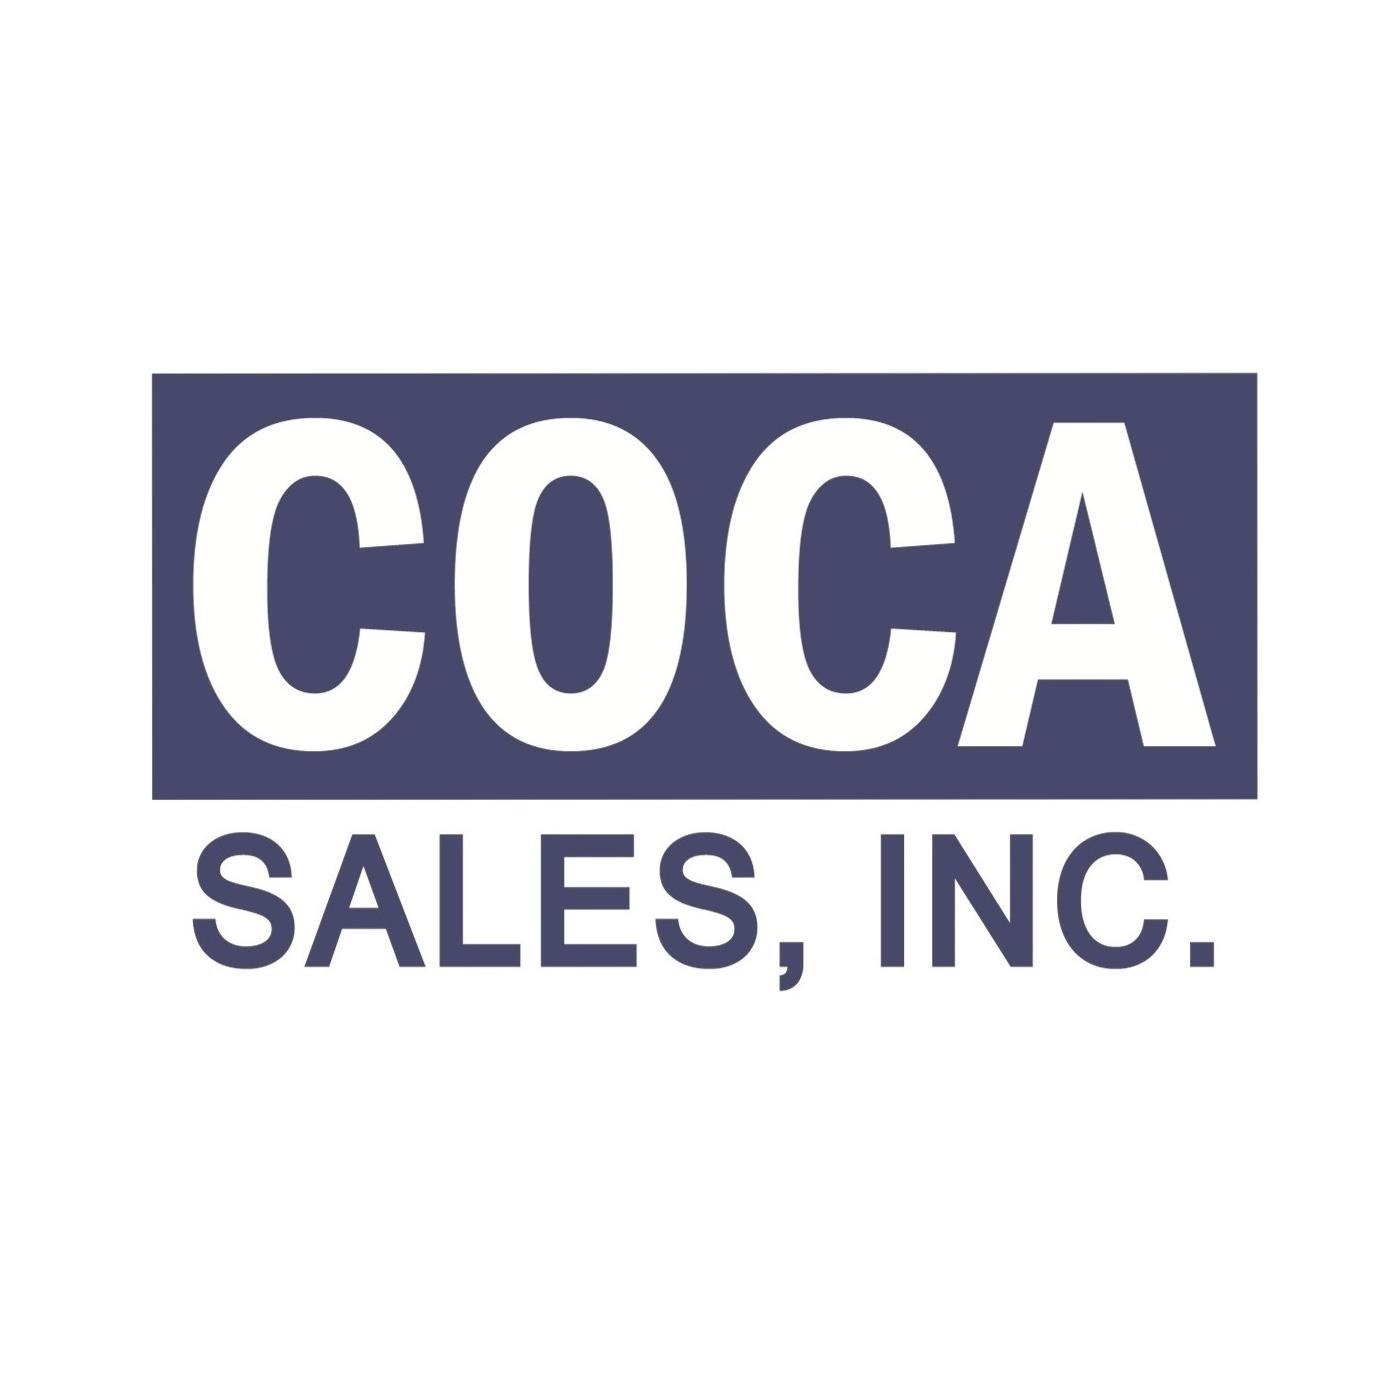 Coca Sales, Inc.   Wire Rope